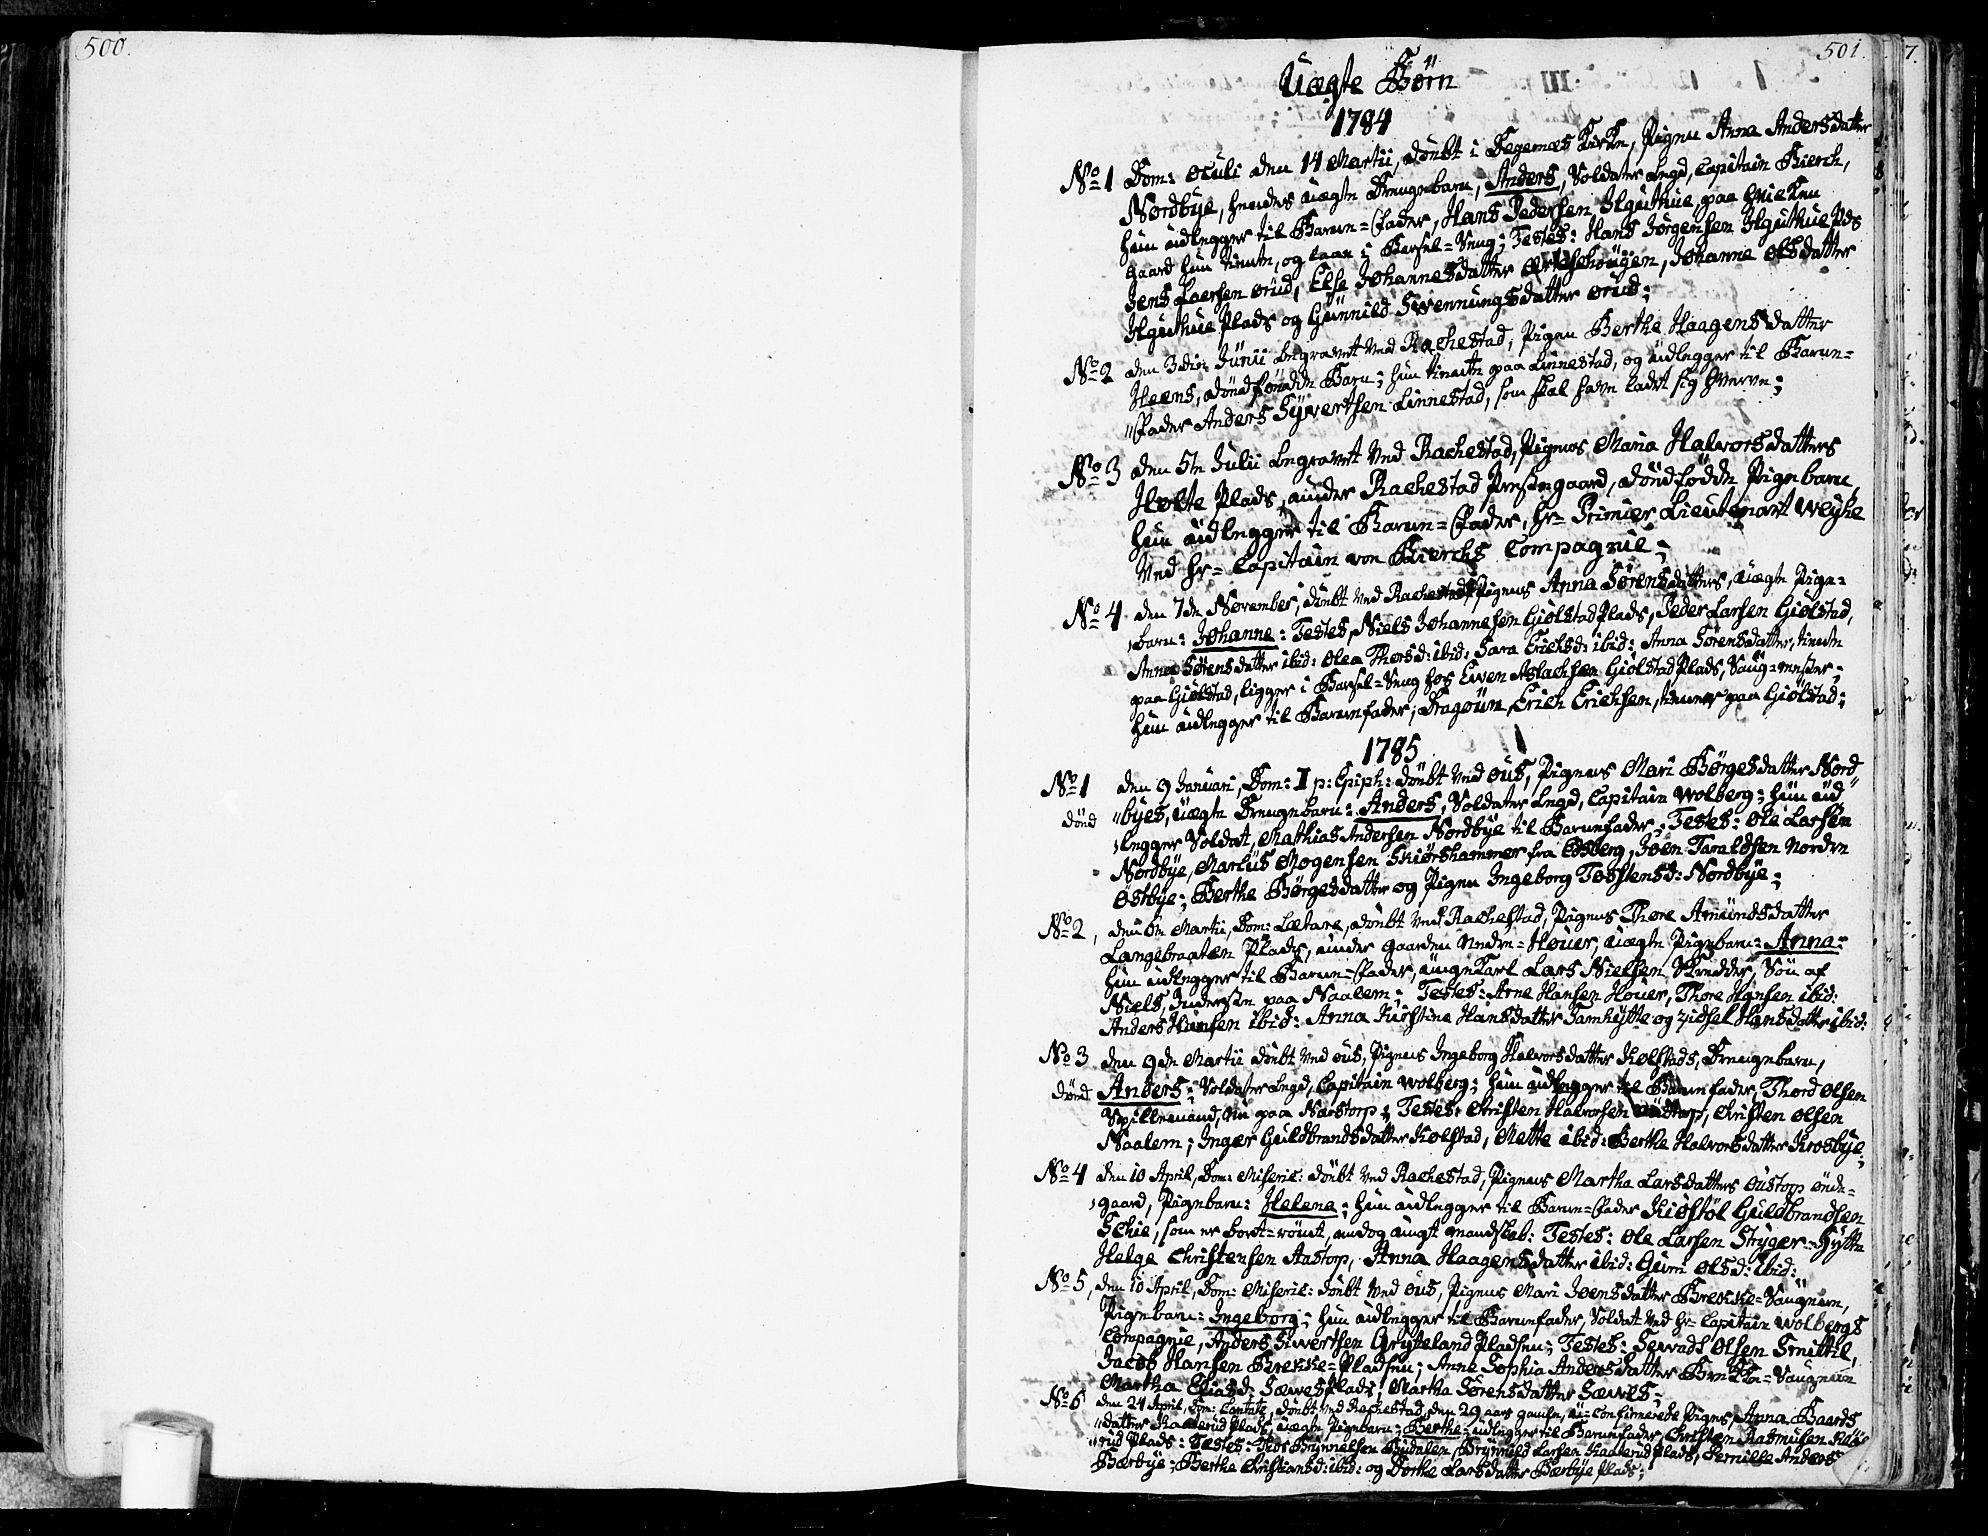 SAO, Rakkestad prestekontor Kirkebøker, F/Fa/L0005: Ministerialbok nr. I 5, 1784-1814, s. 500-501